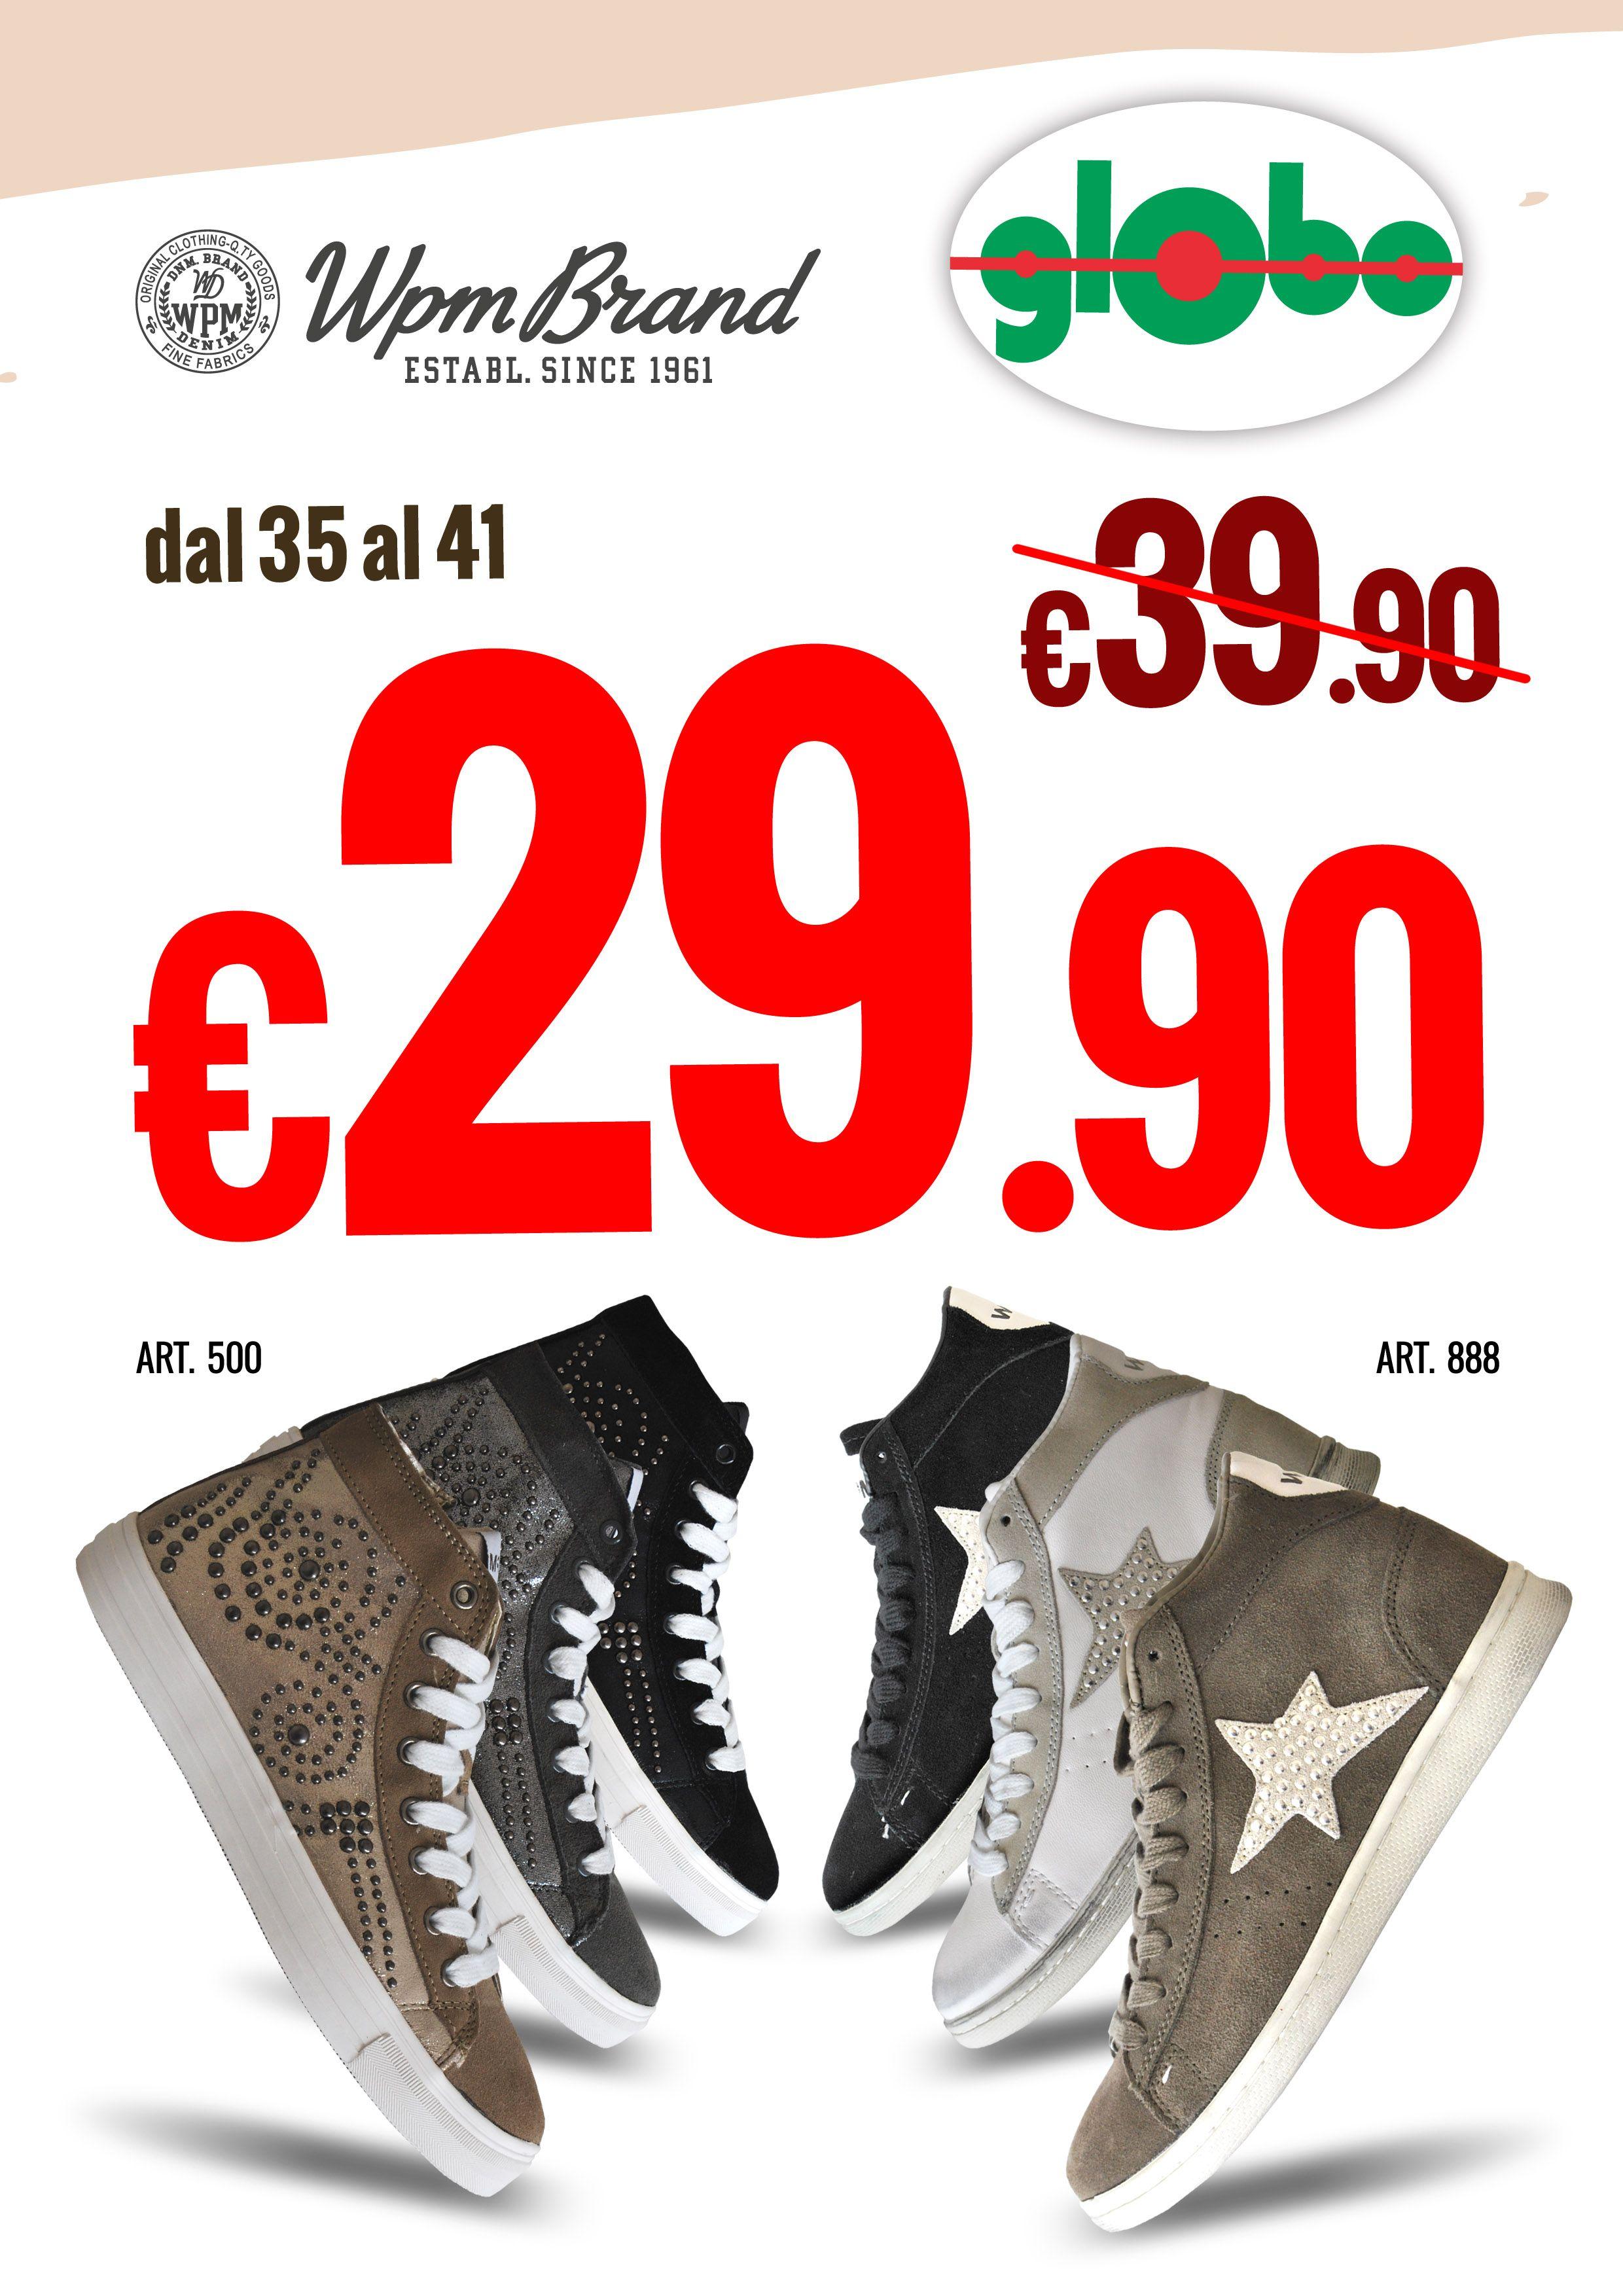 90Globo Company Calzature Donna € A ImperdibiliWampum 29 Logo OkPiZuTX